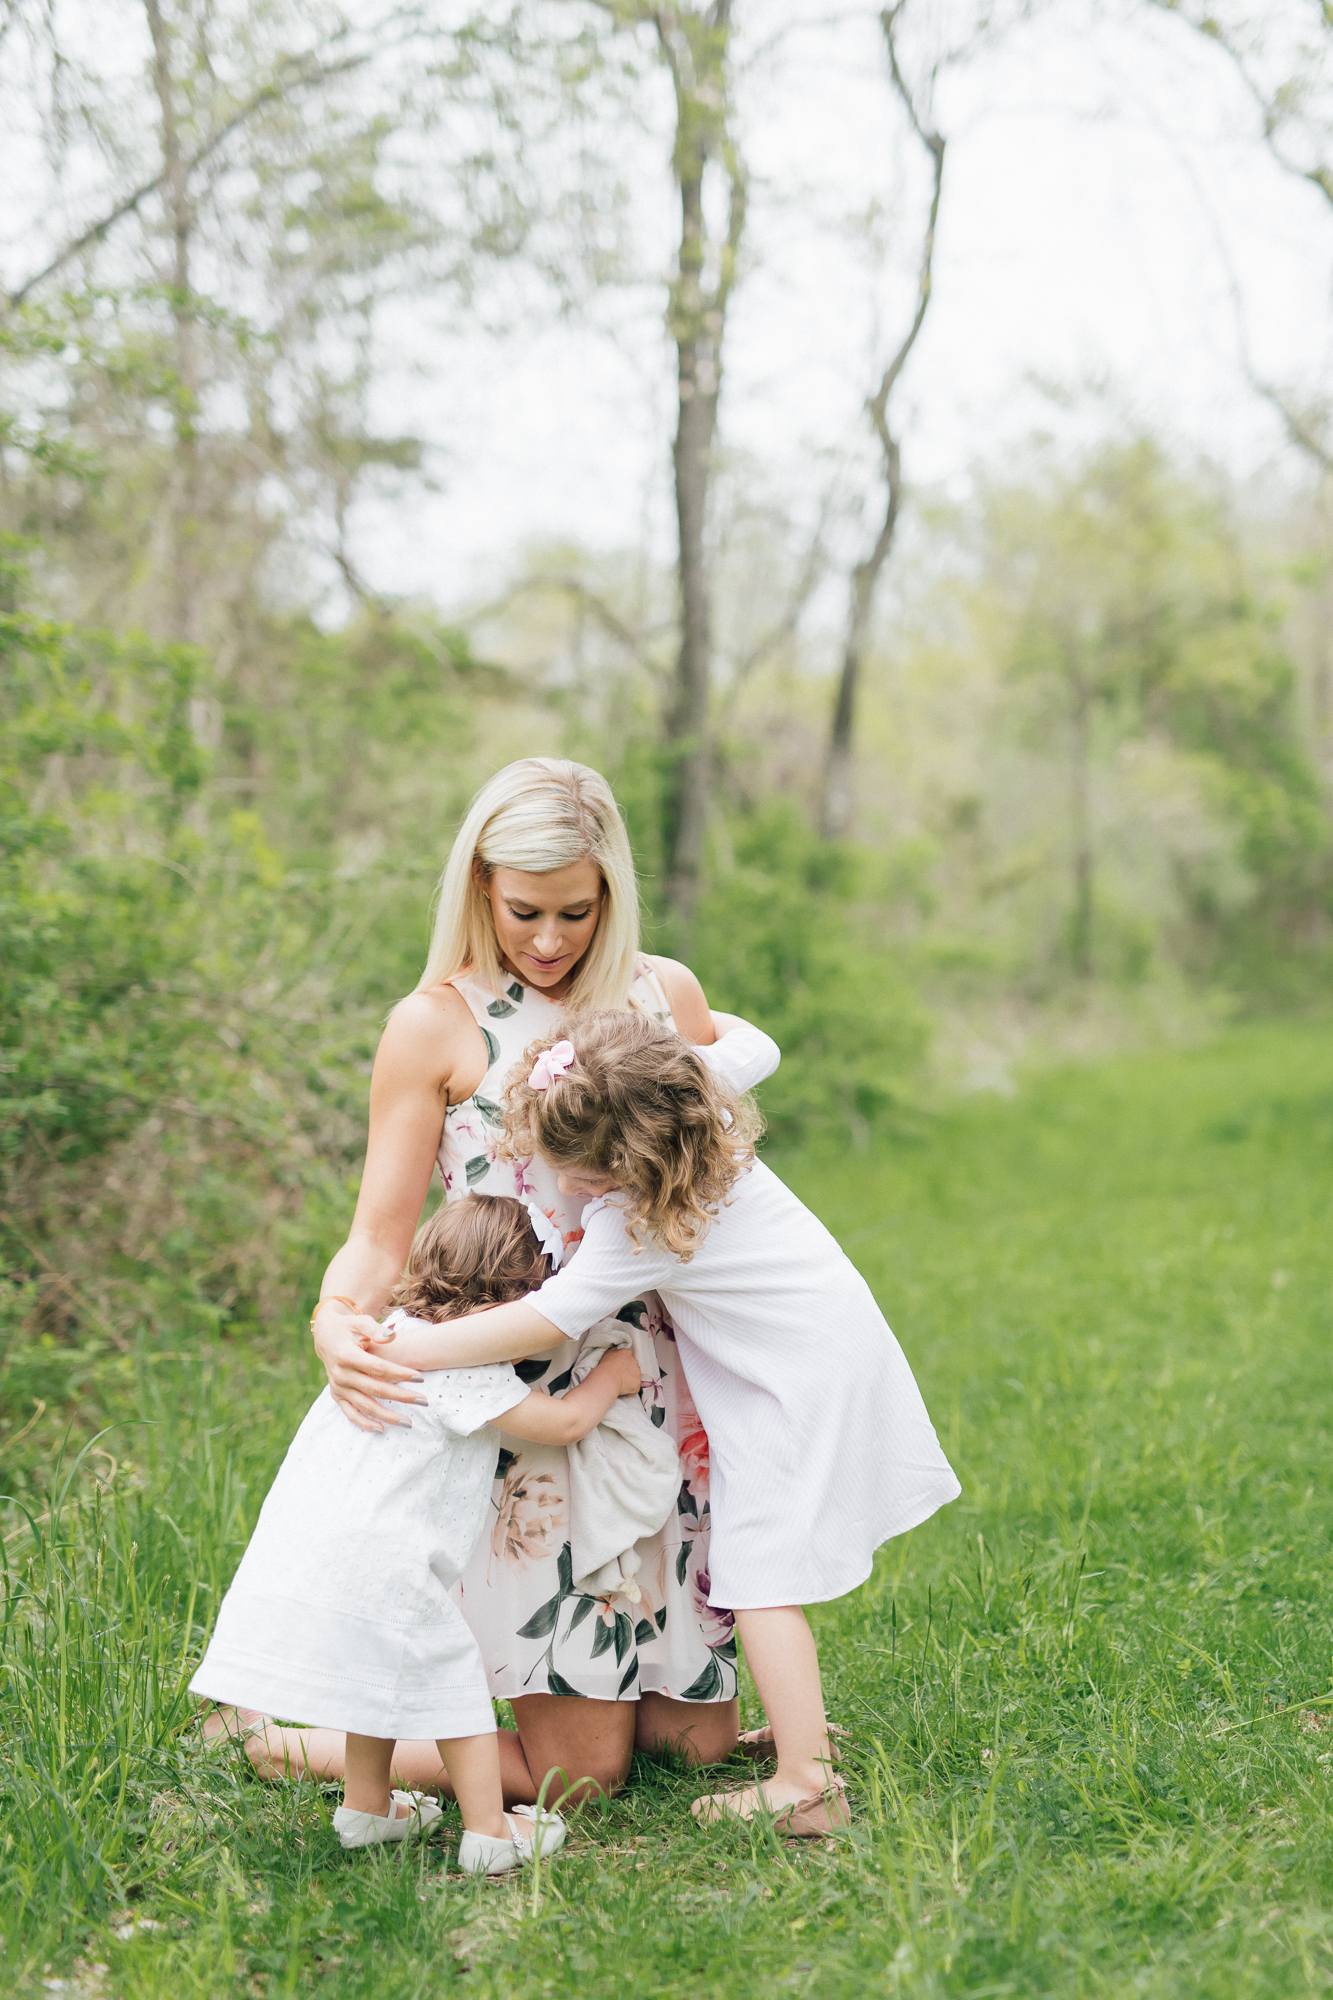 motherhood photographer CT_CT motherhood photos